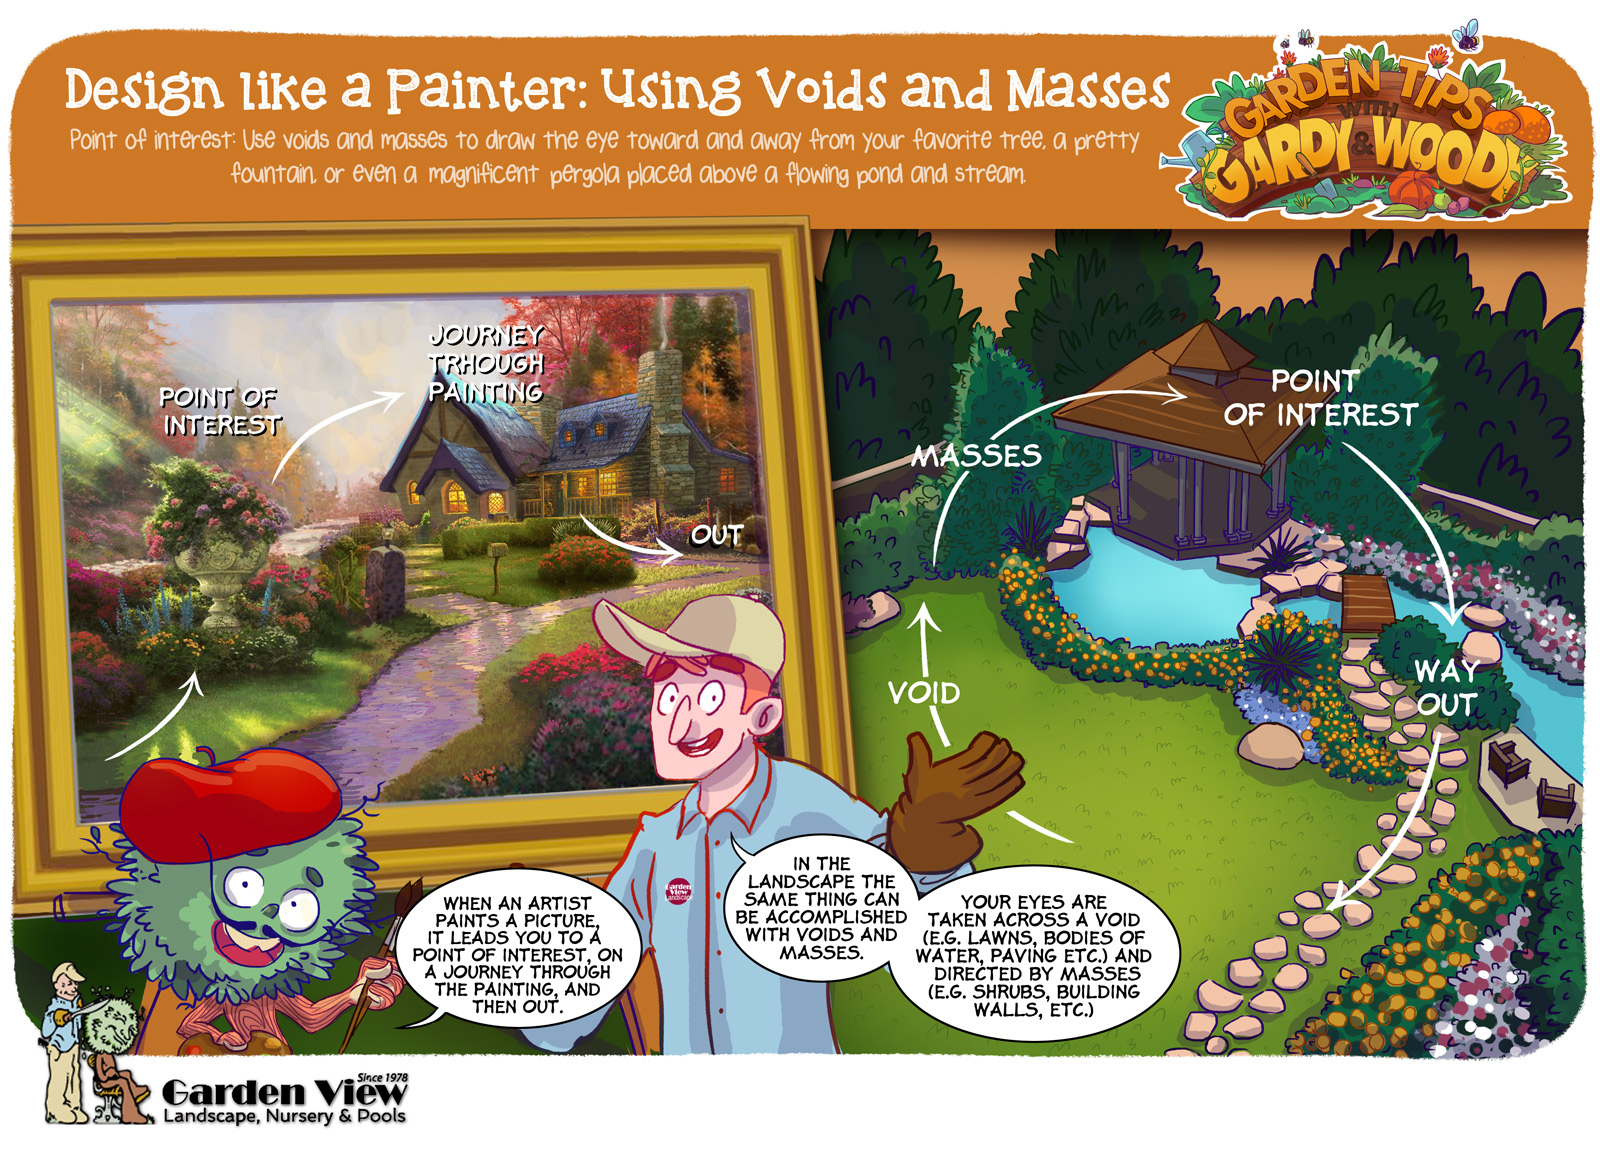 Voids and Masses in the Landscape proper design